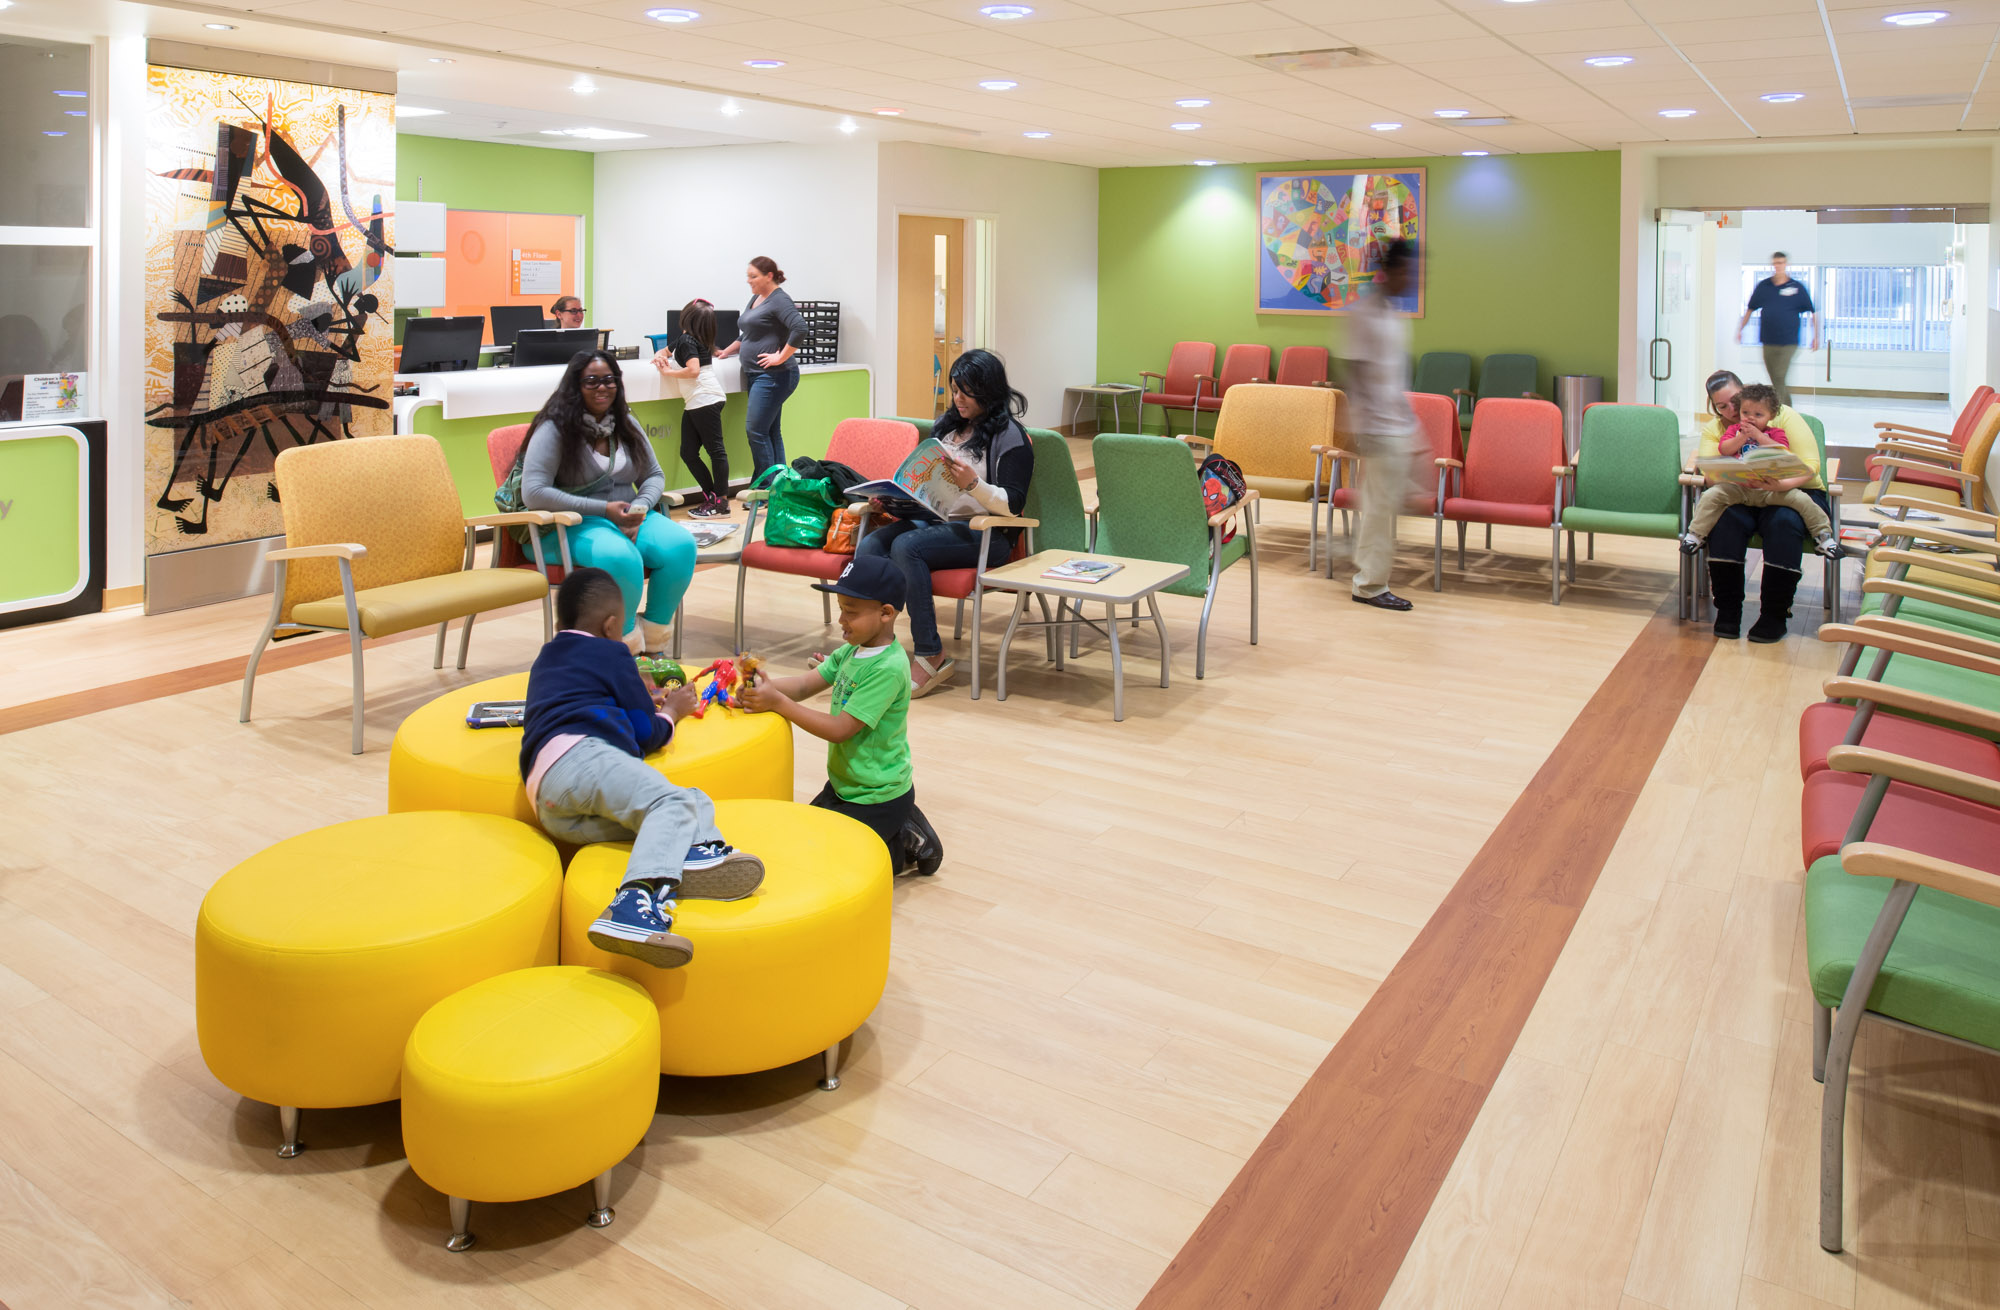 DMC carls reno waiting room kn01 web size.jpg